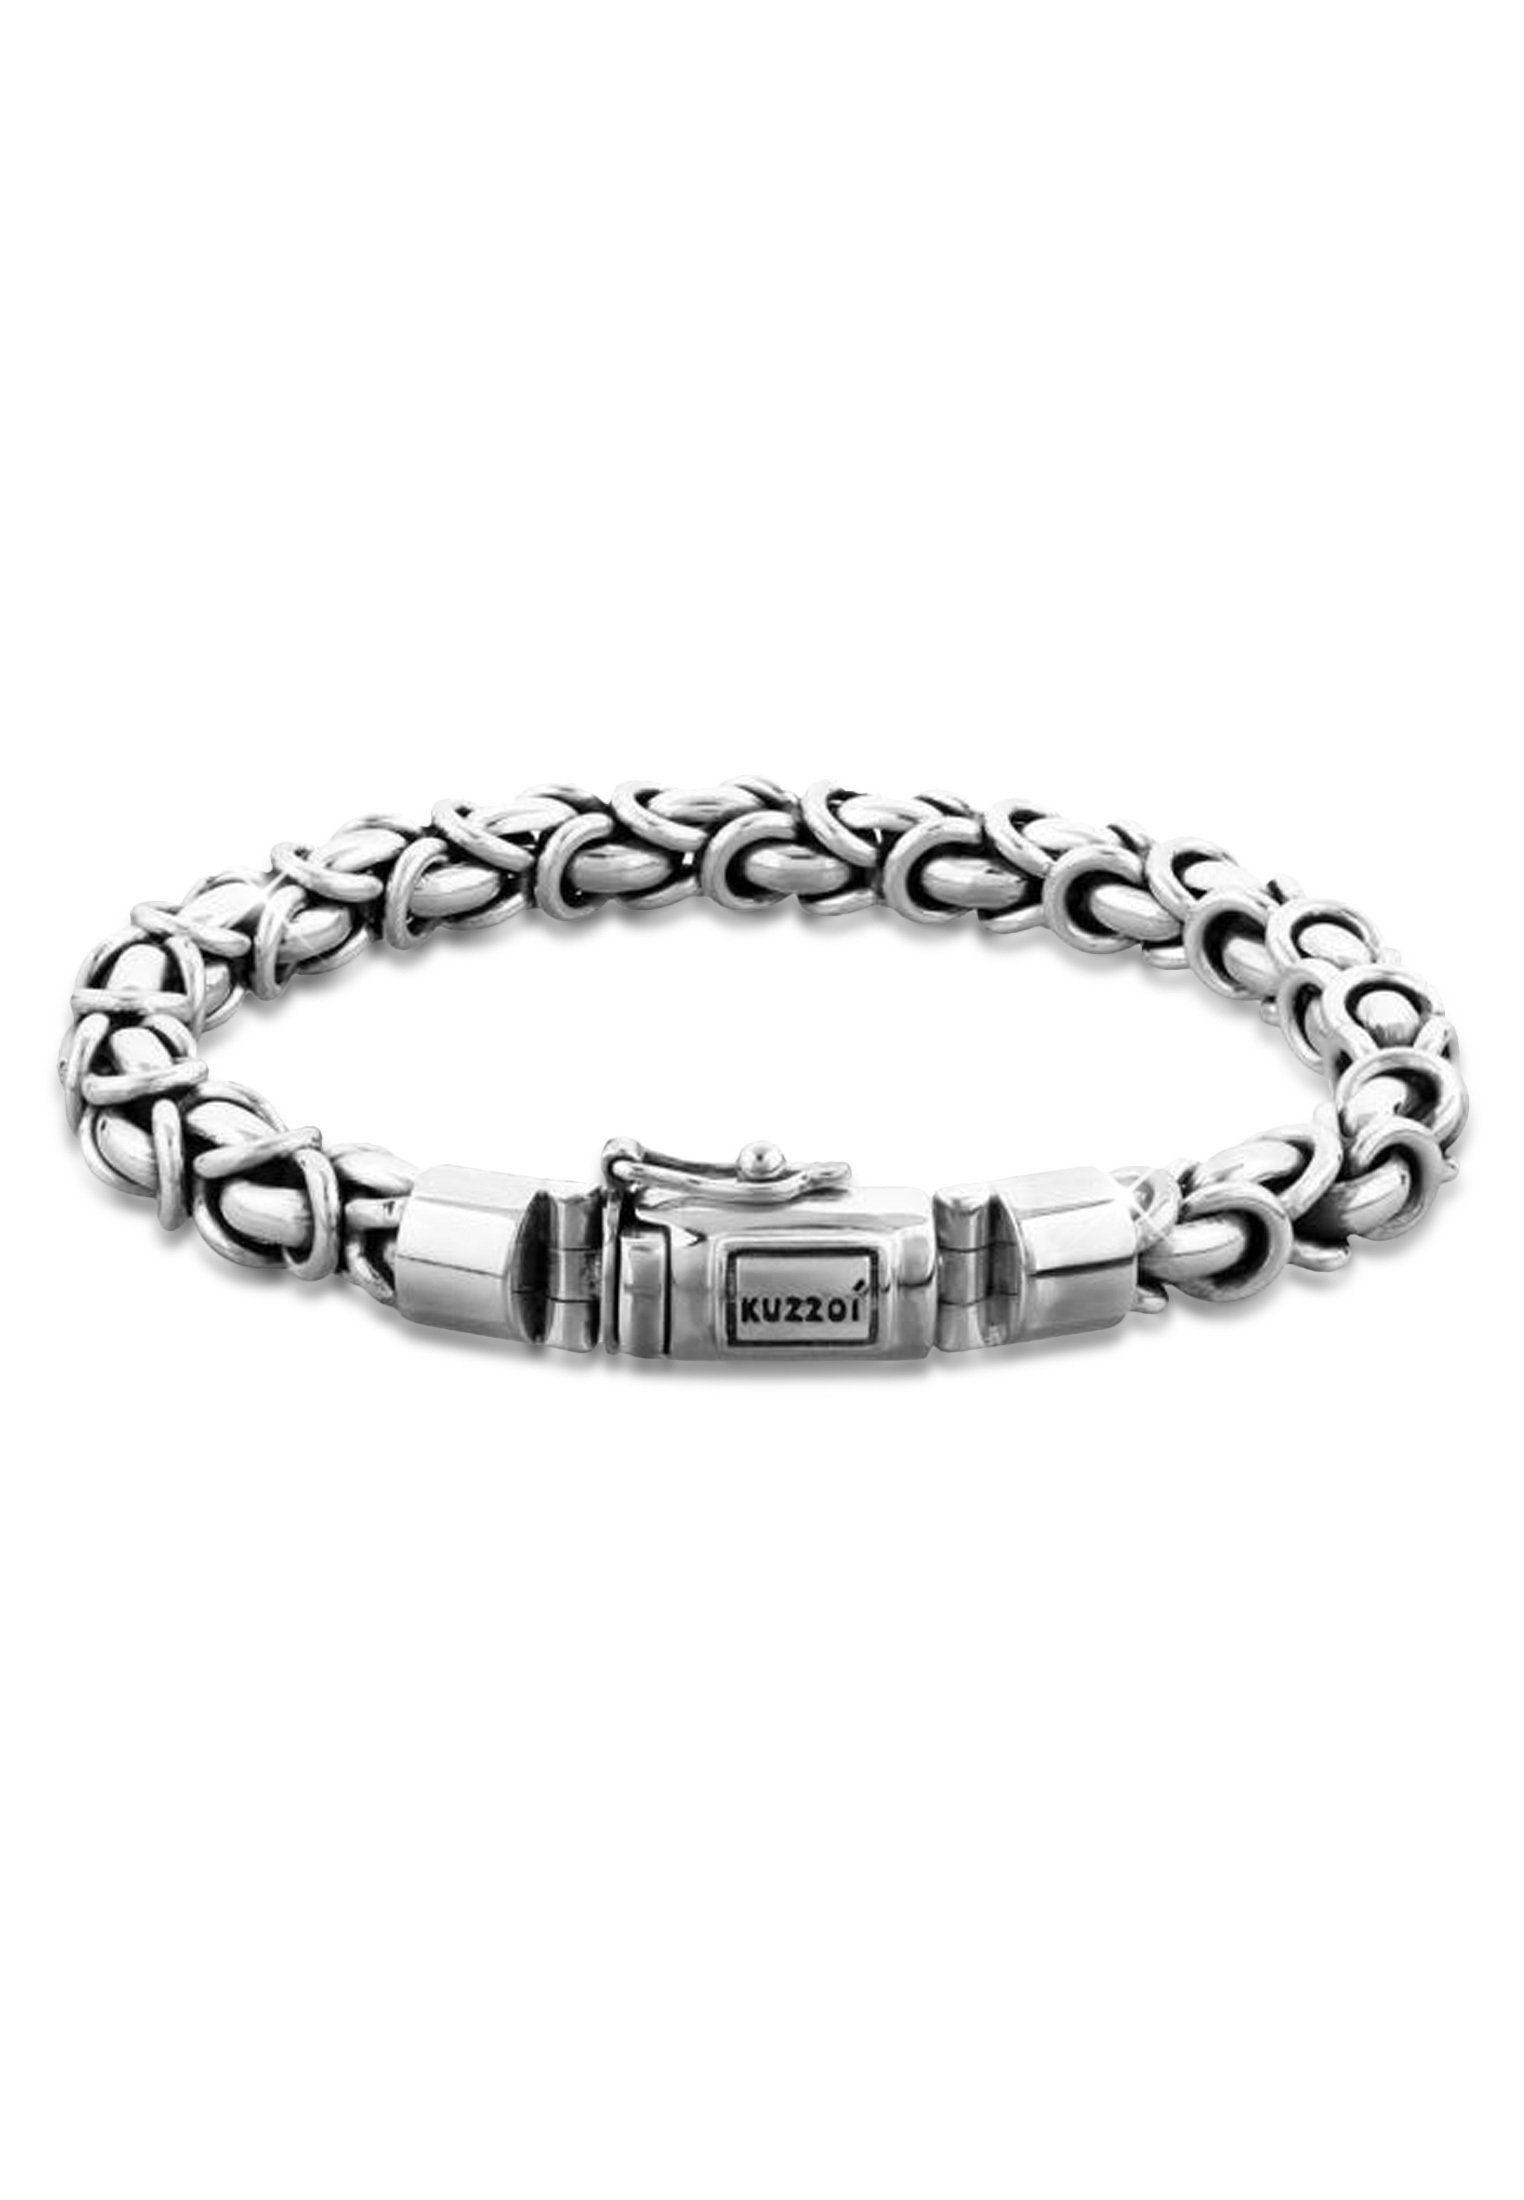 Kuzzoi Armband »Herren Panzerarmband Königskette Basic 925 Silber« online kaufen   OTTO